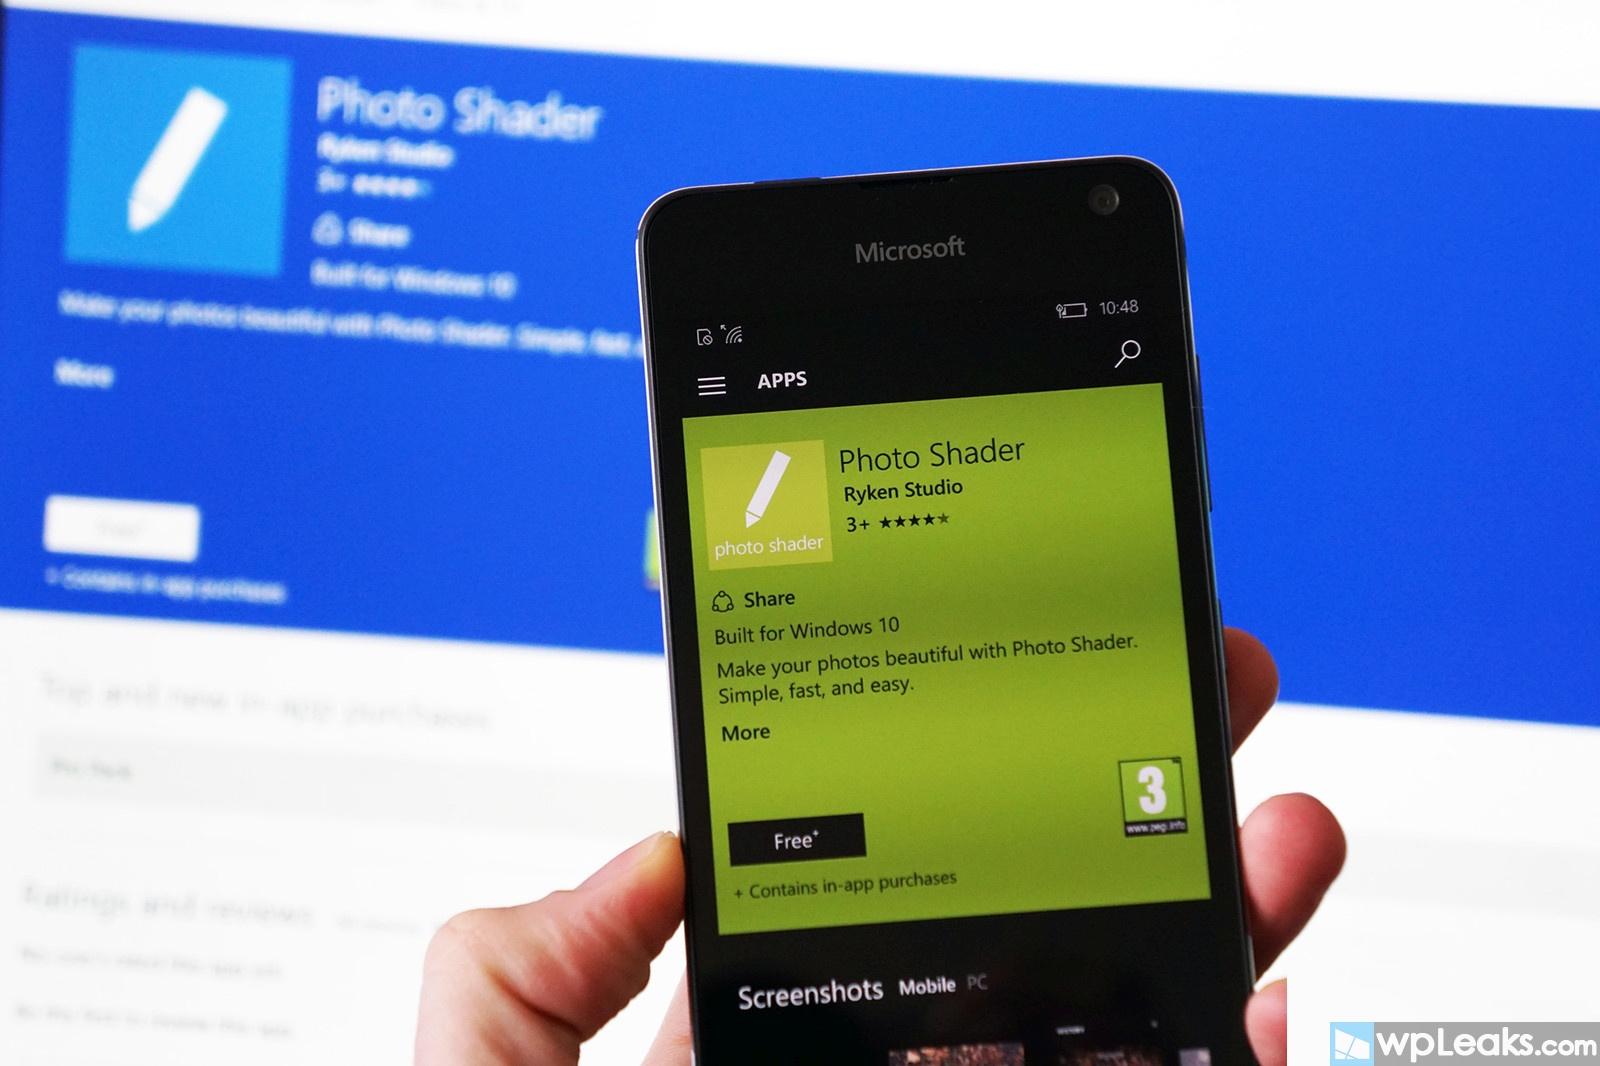 photo-shader-windows-10